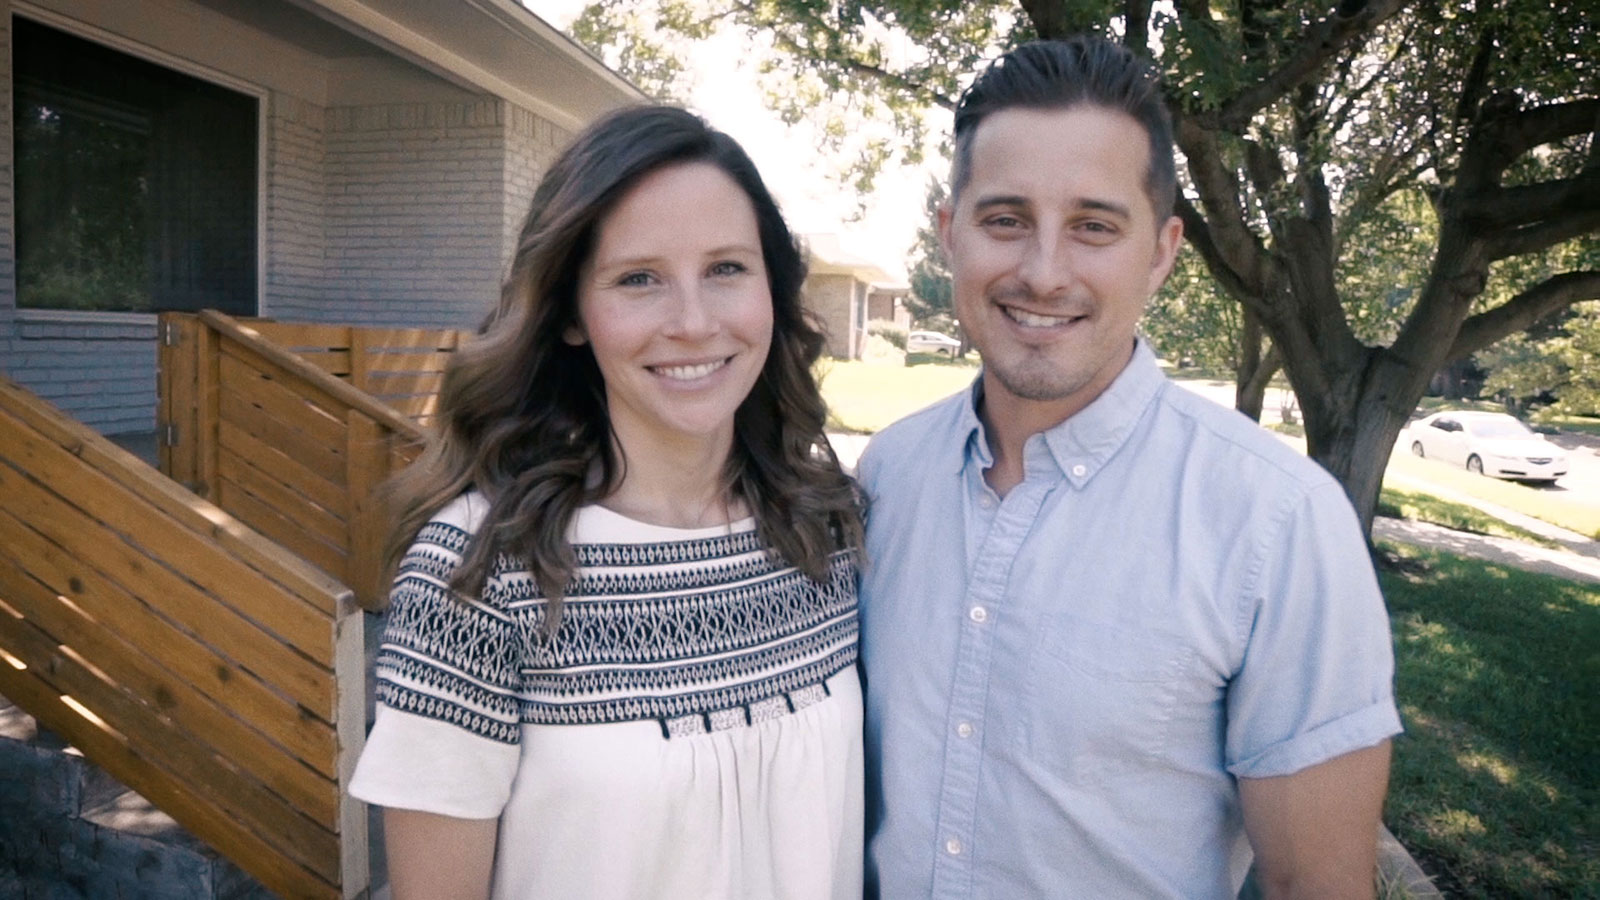 Watch the Steadkey homebuyers video